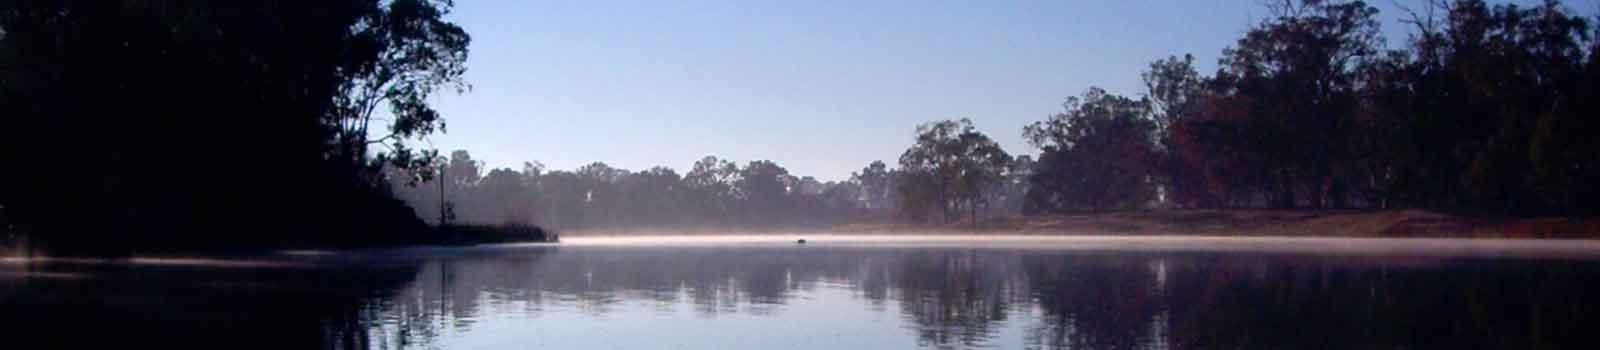 River_Mist_HEADER